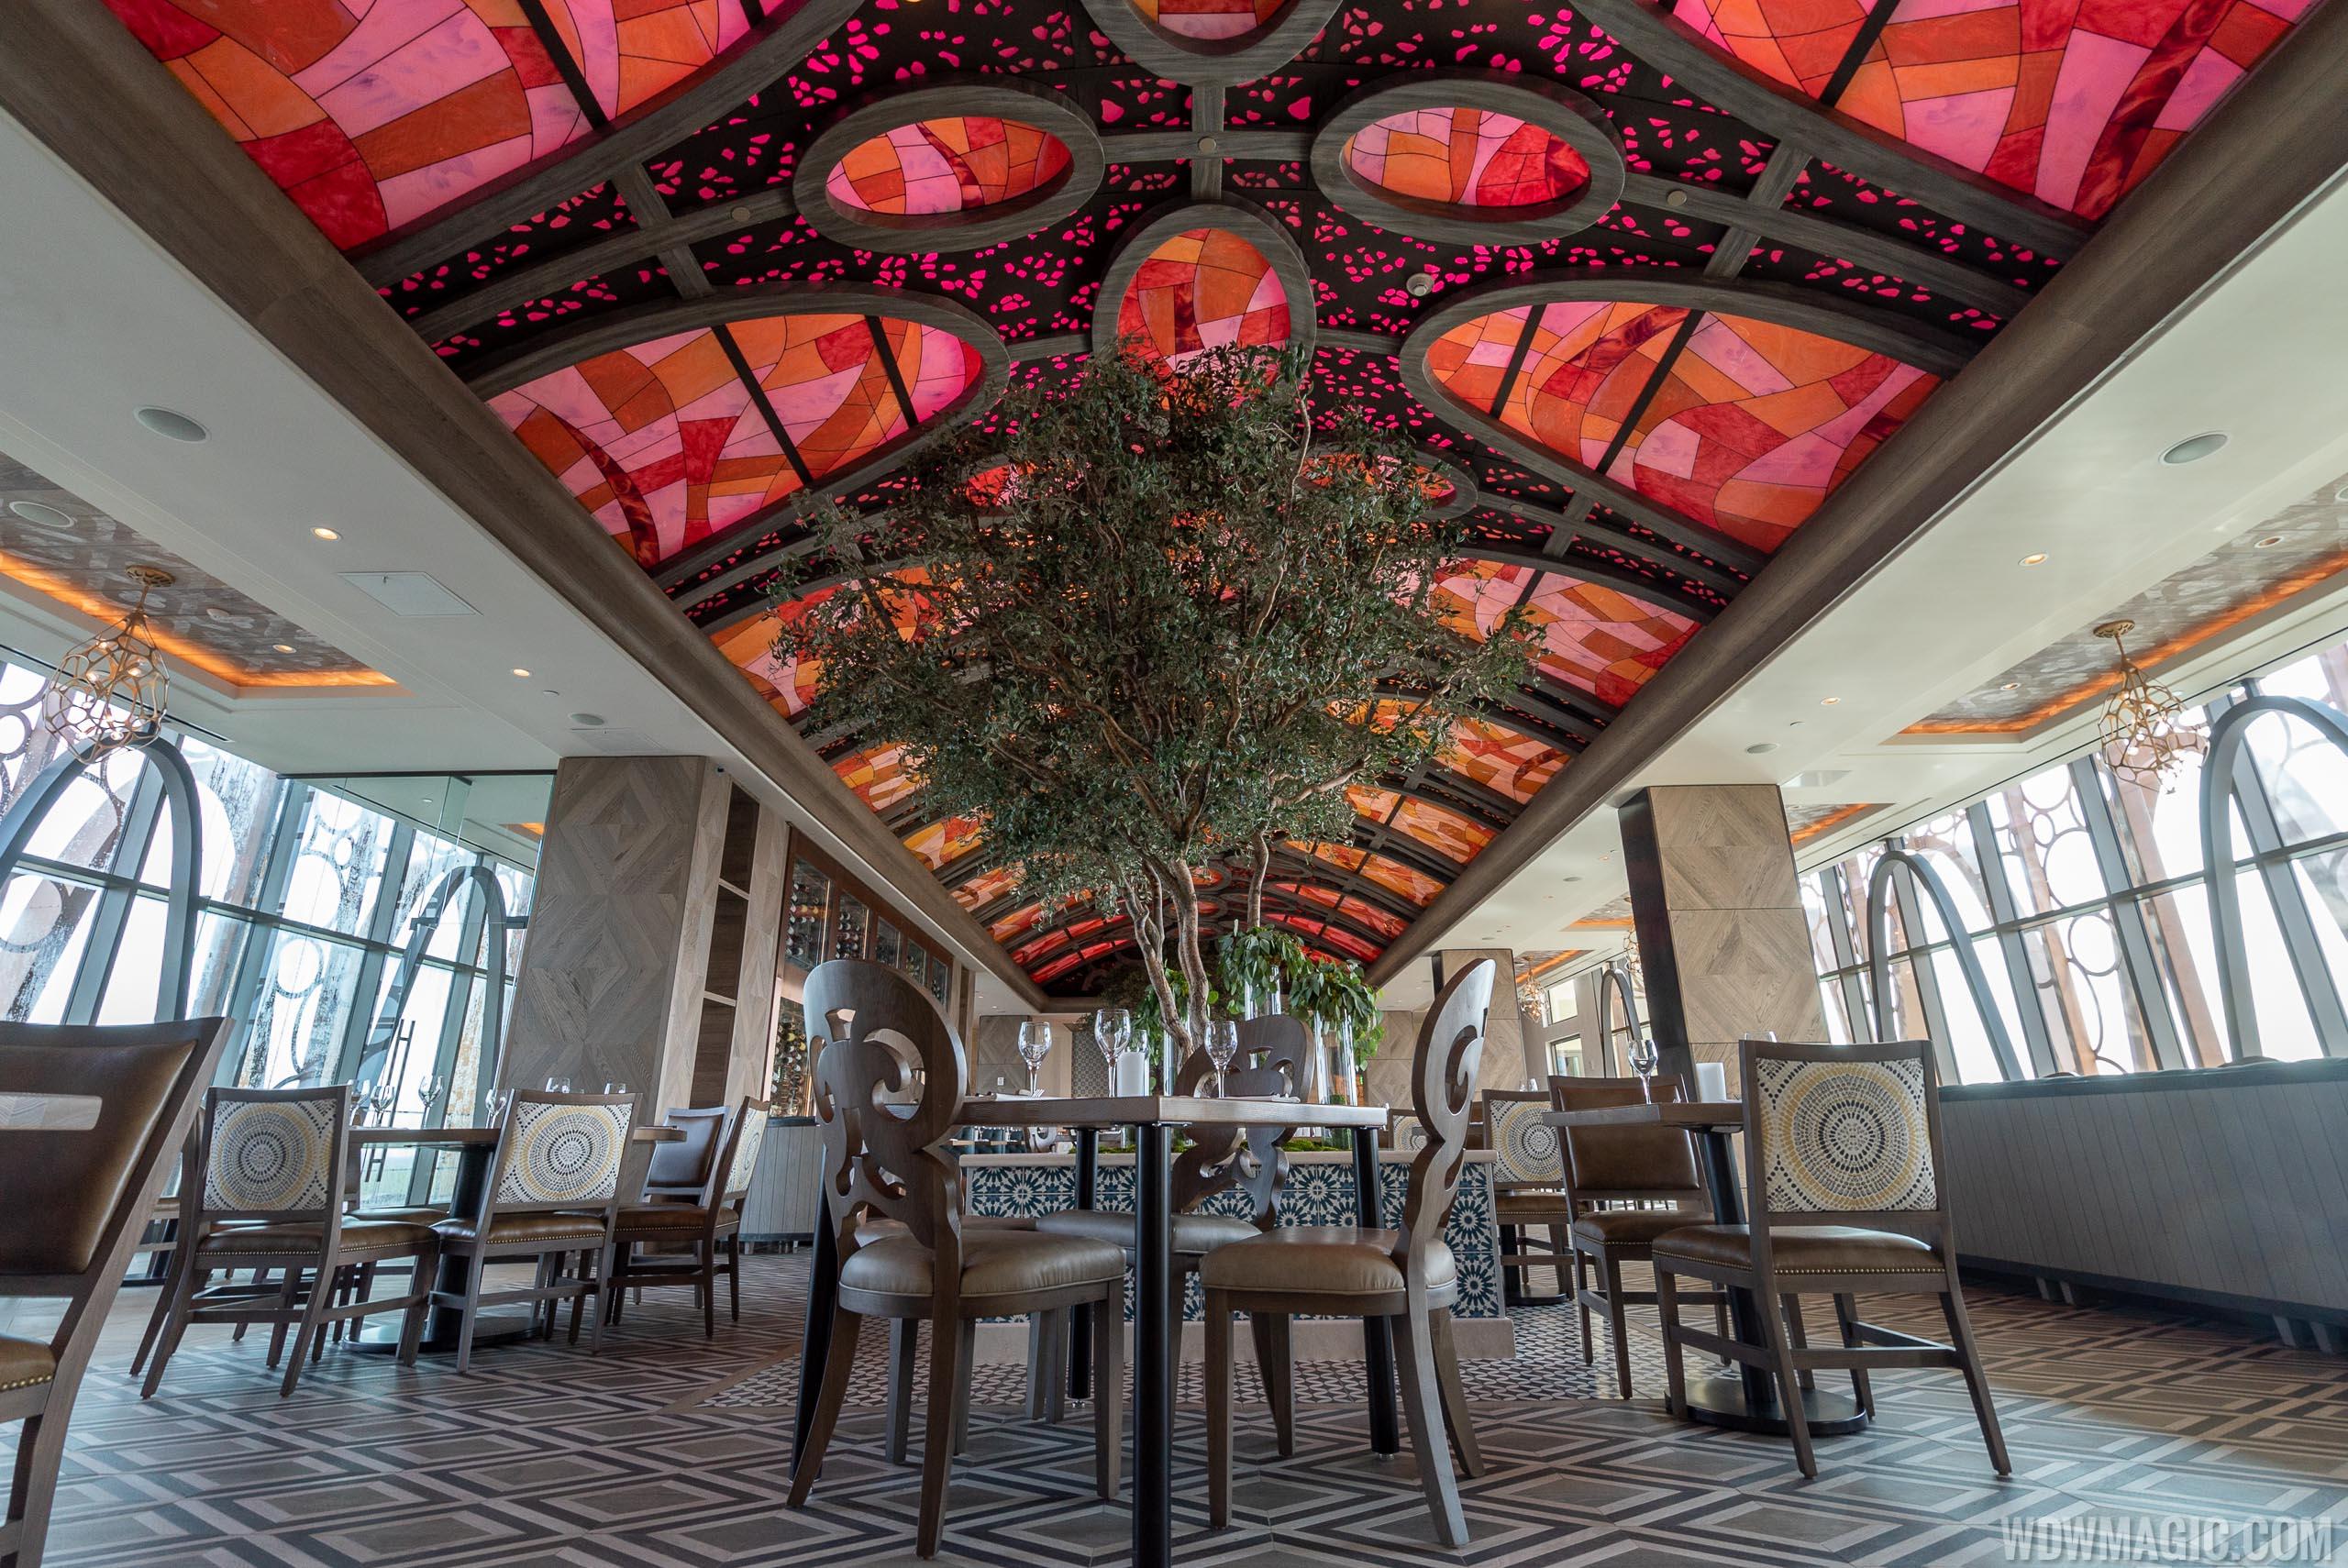 Toledo - one of the latest table service restaurants at Walt Disney World